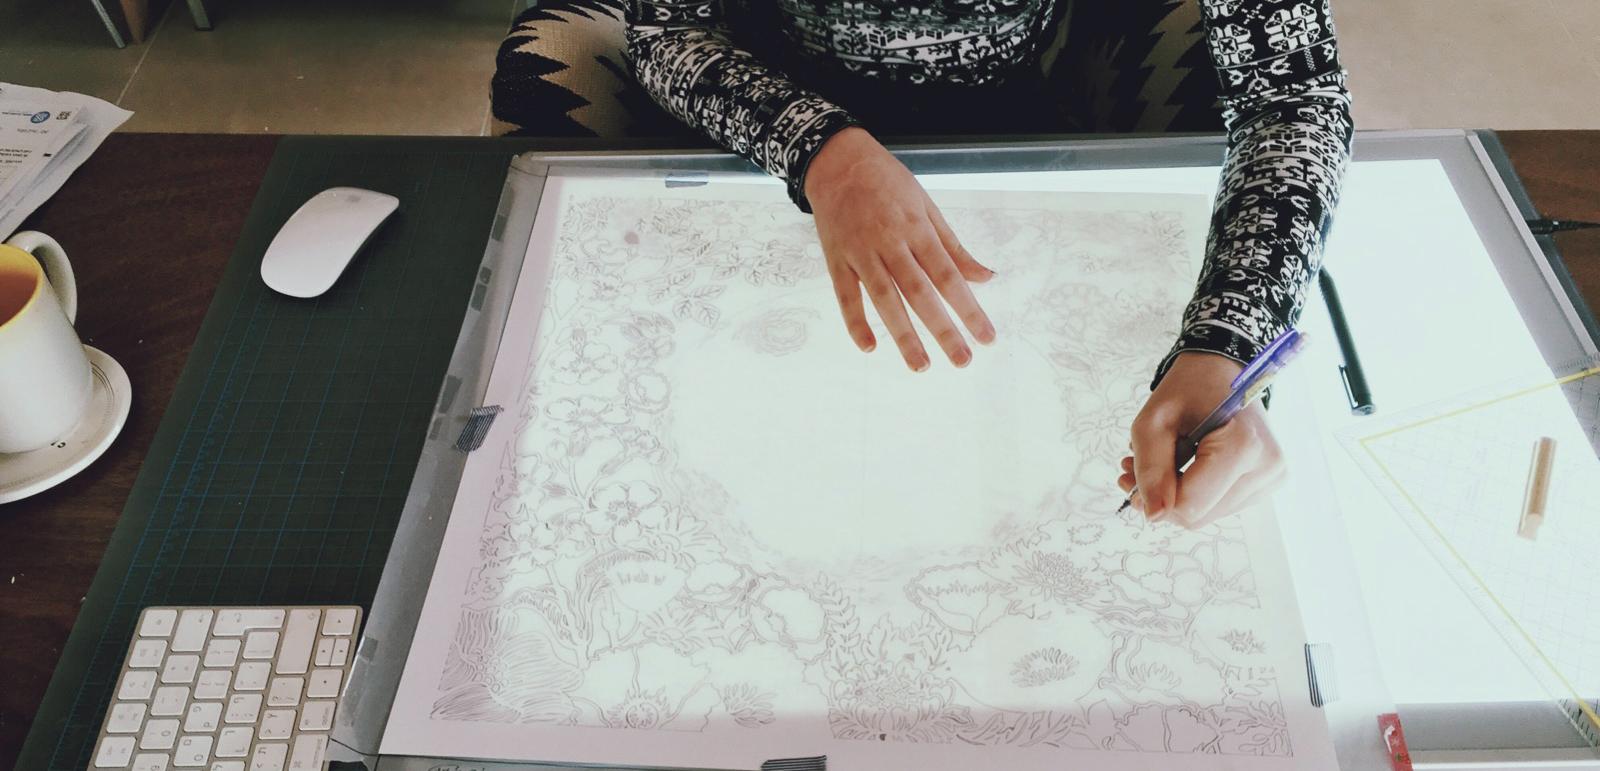 papercutting step 1